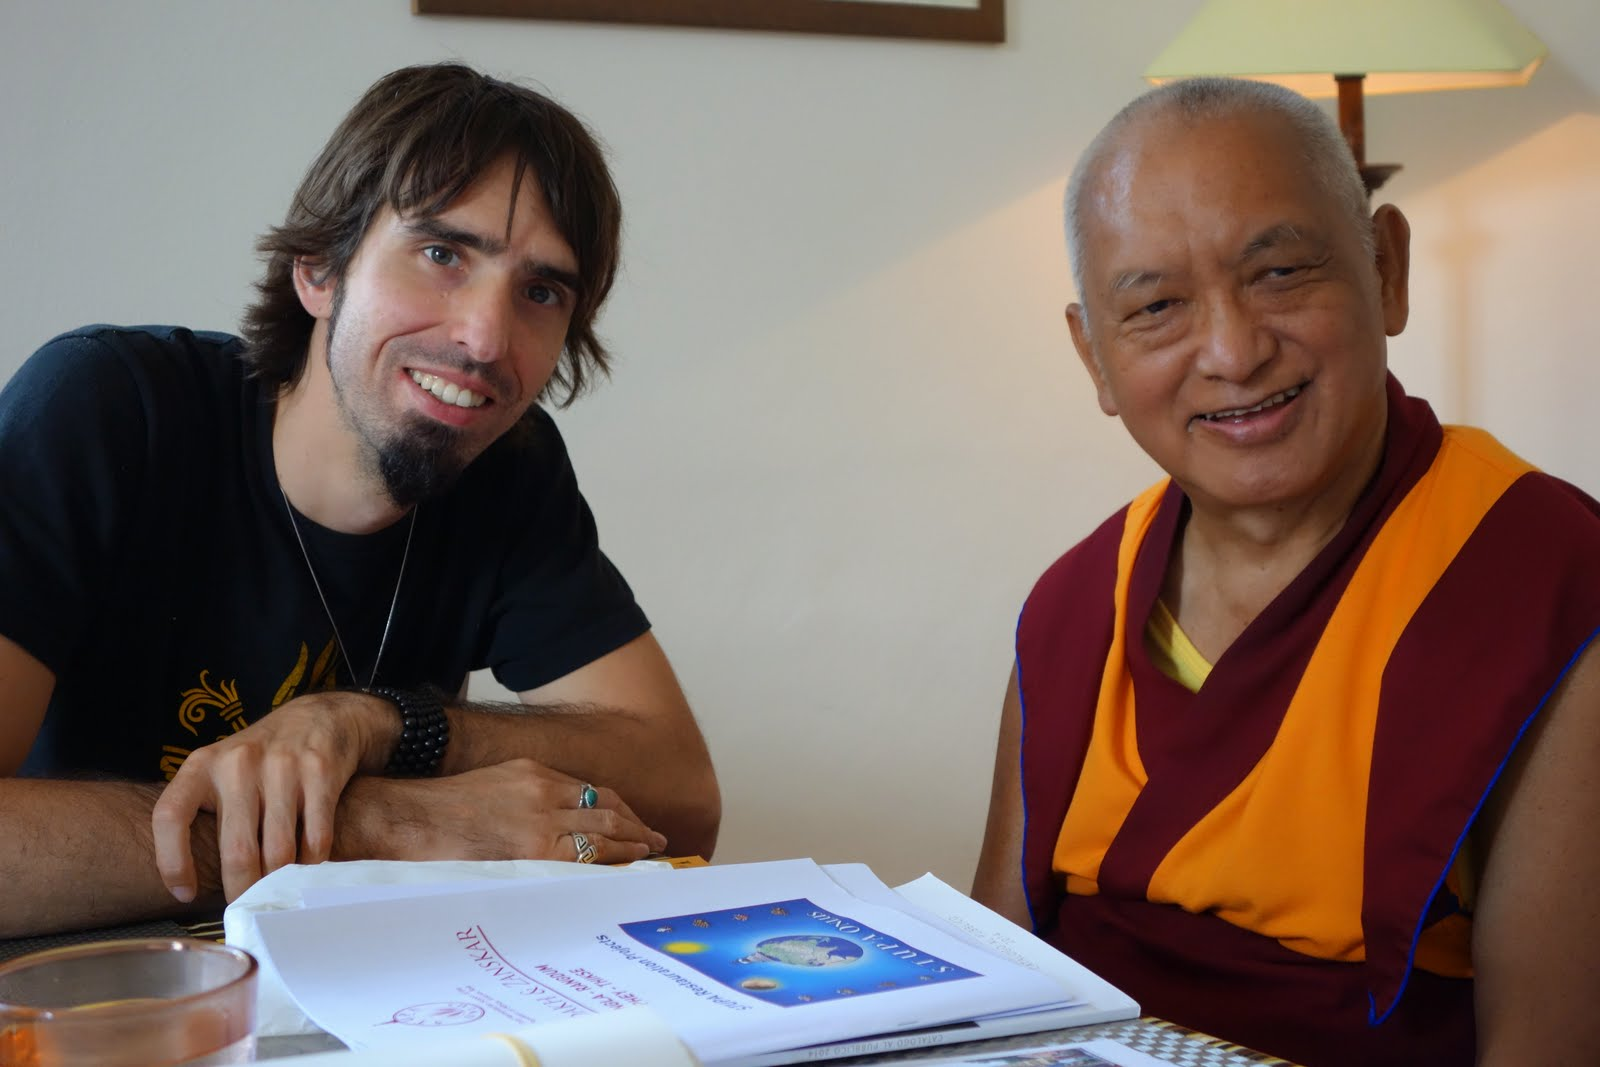 LamaZopaRinpocheandOseljustafterhavinglunchtogether. OselwasinItalyforHisHoliness the Dalai Lama'steachings. Photo byVen.RogerKunsang, June2014